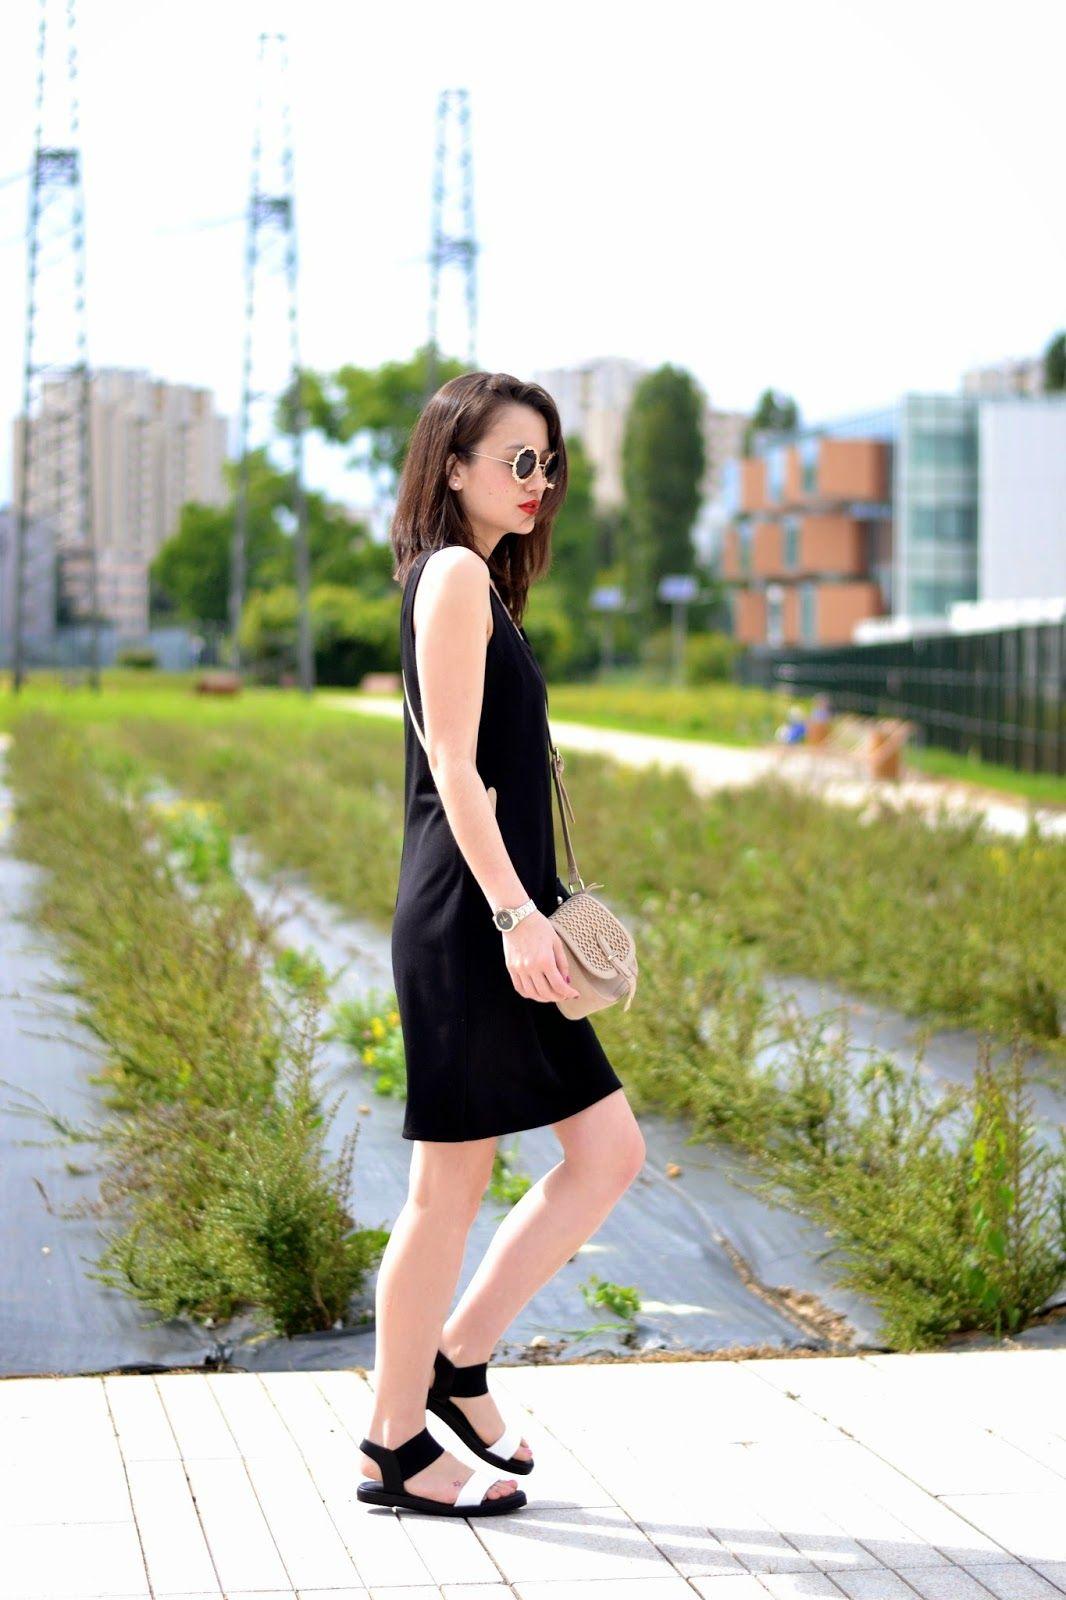 How to wear black dress